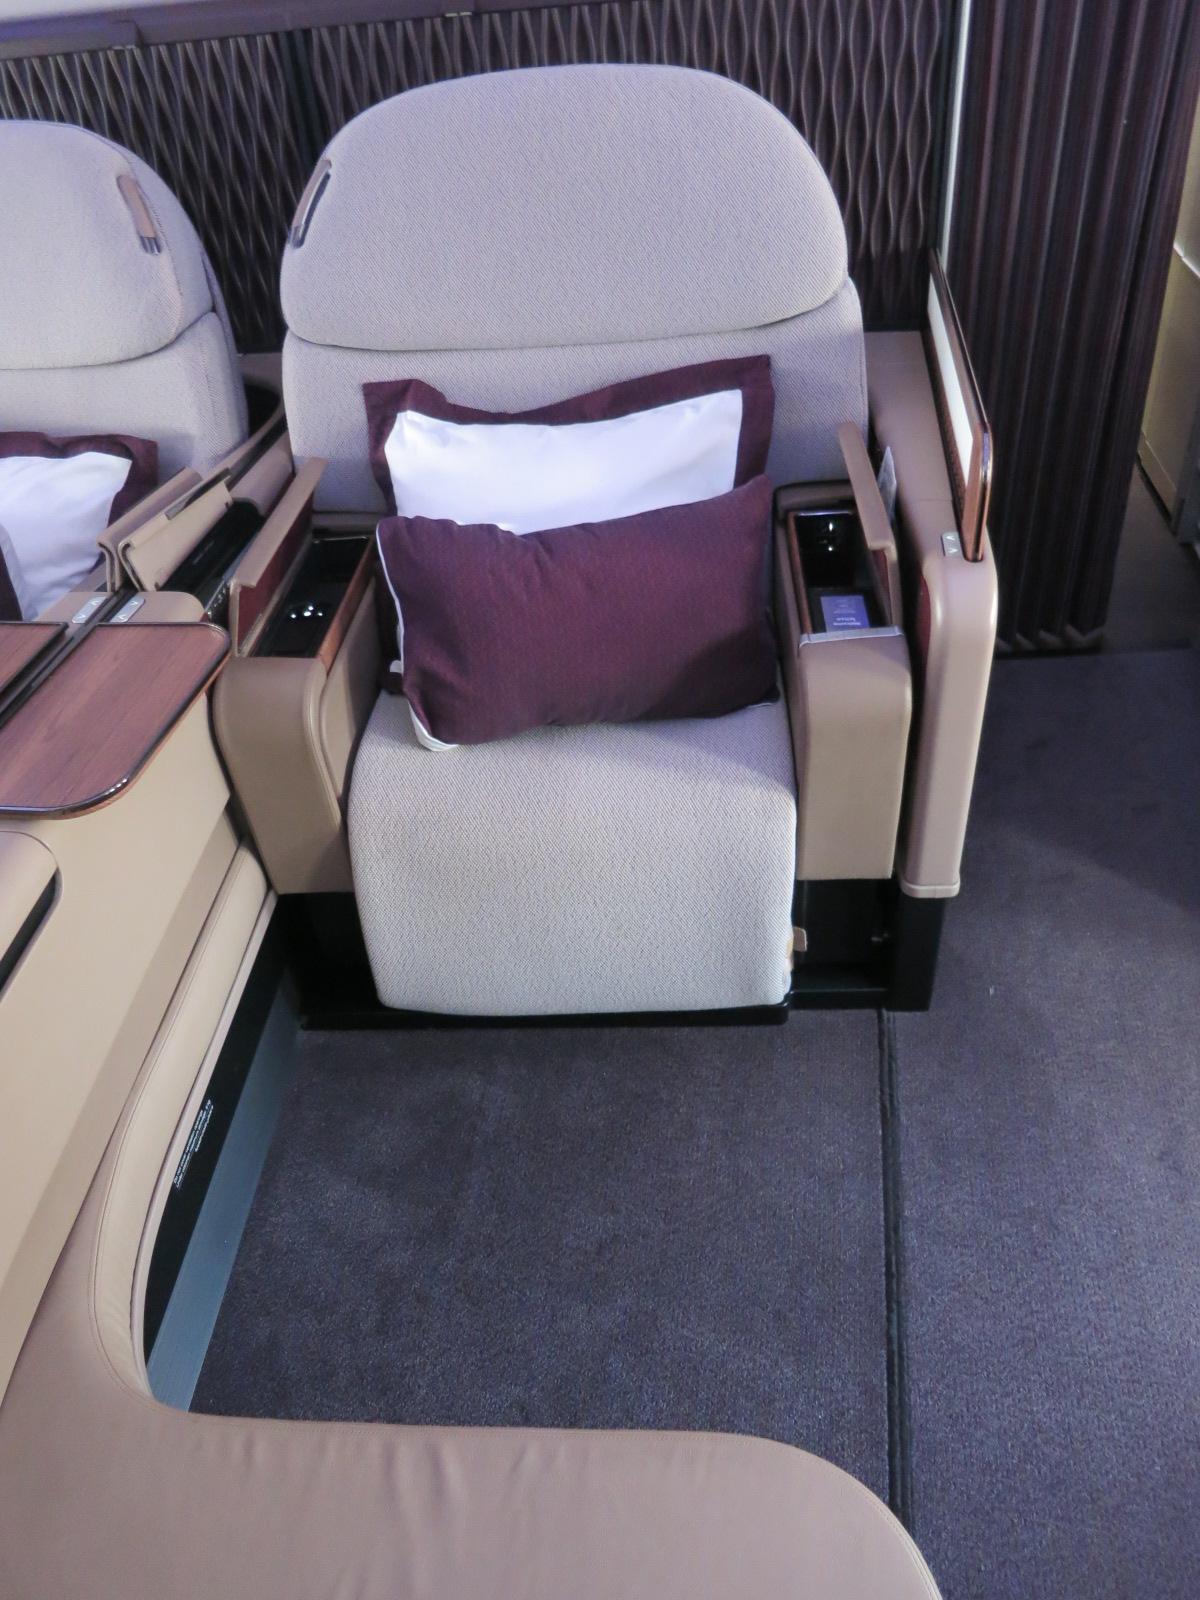 Qatar Airways A380 first class seat Bangkok-Doha